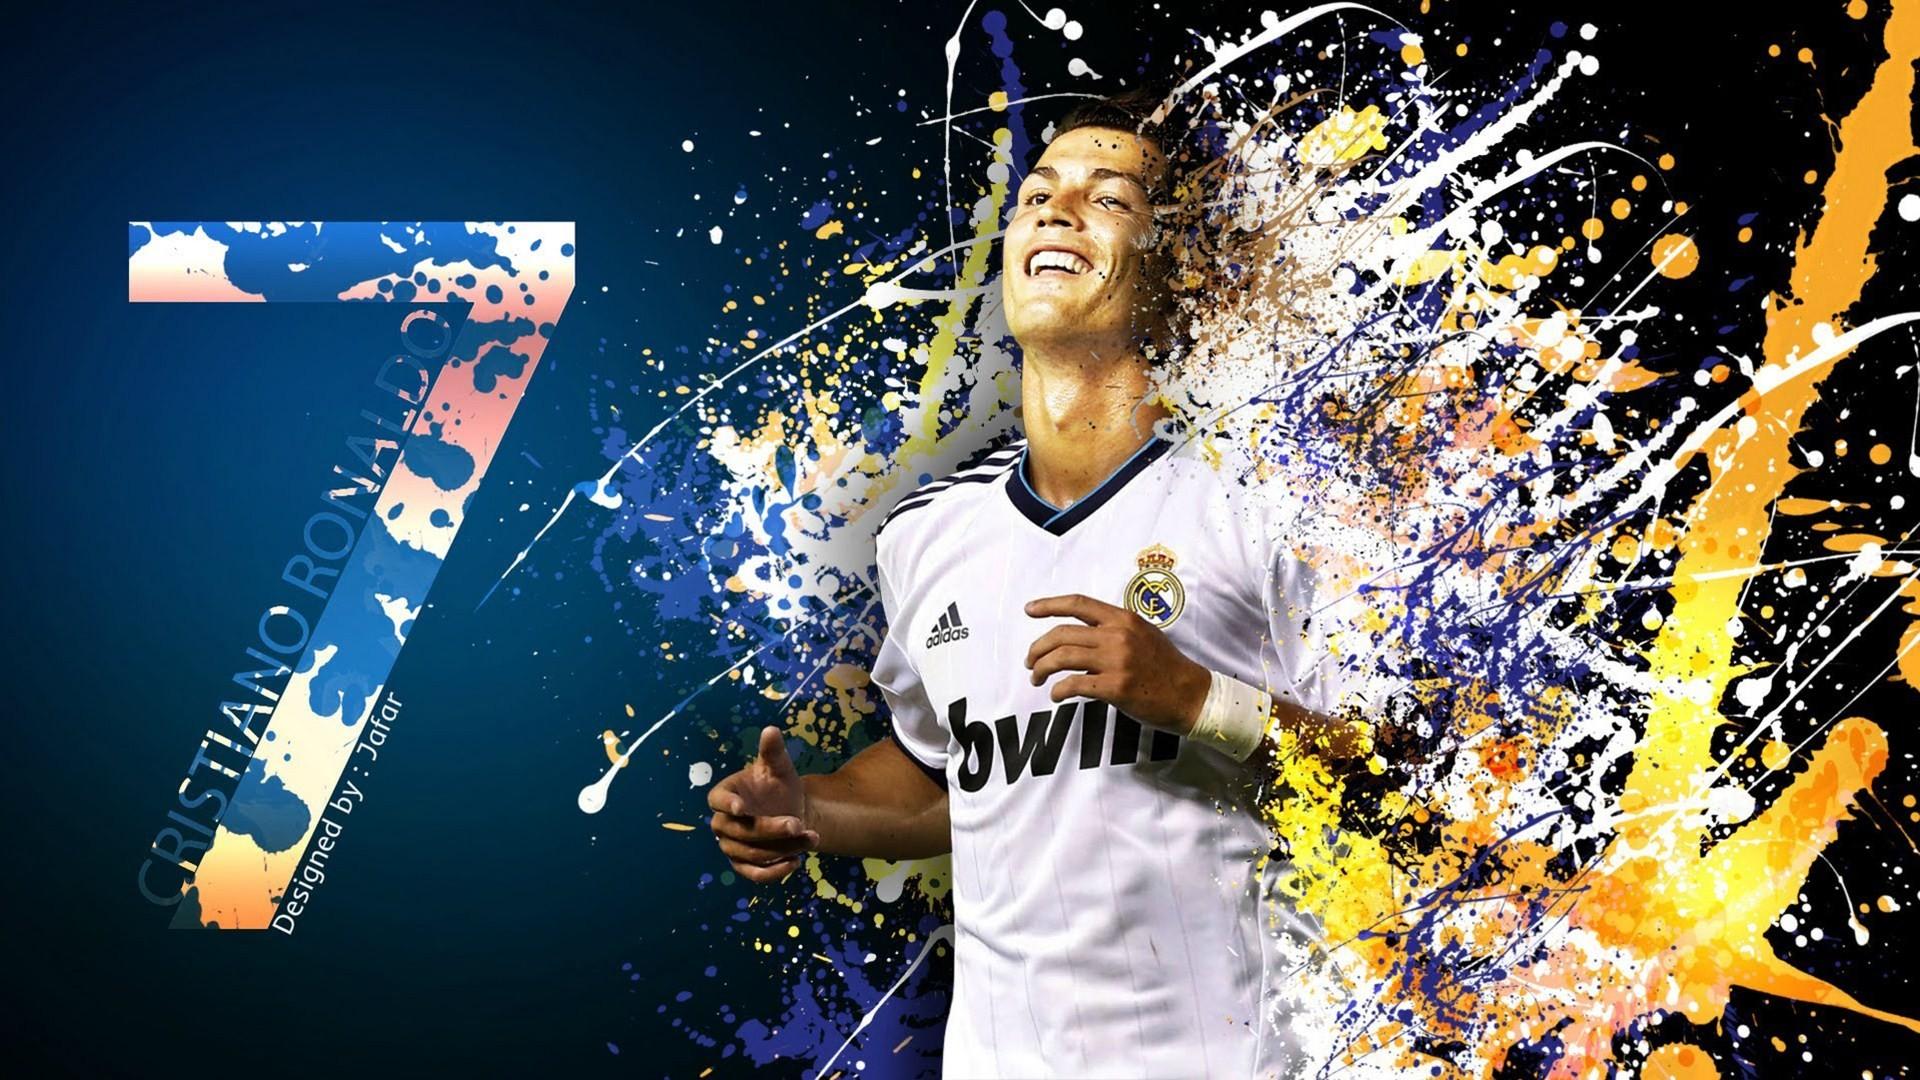 Pin by ShirtsHeaven on Christiano Ronaldo   Pinterest   Messi and Ronaldo